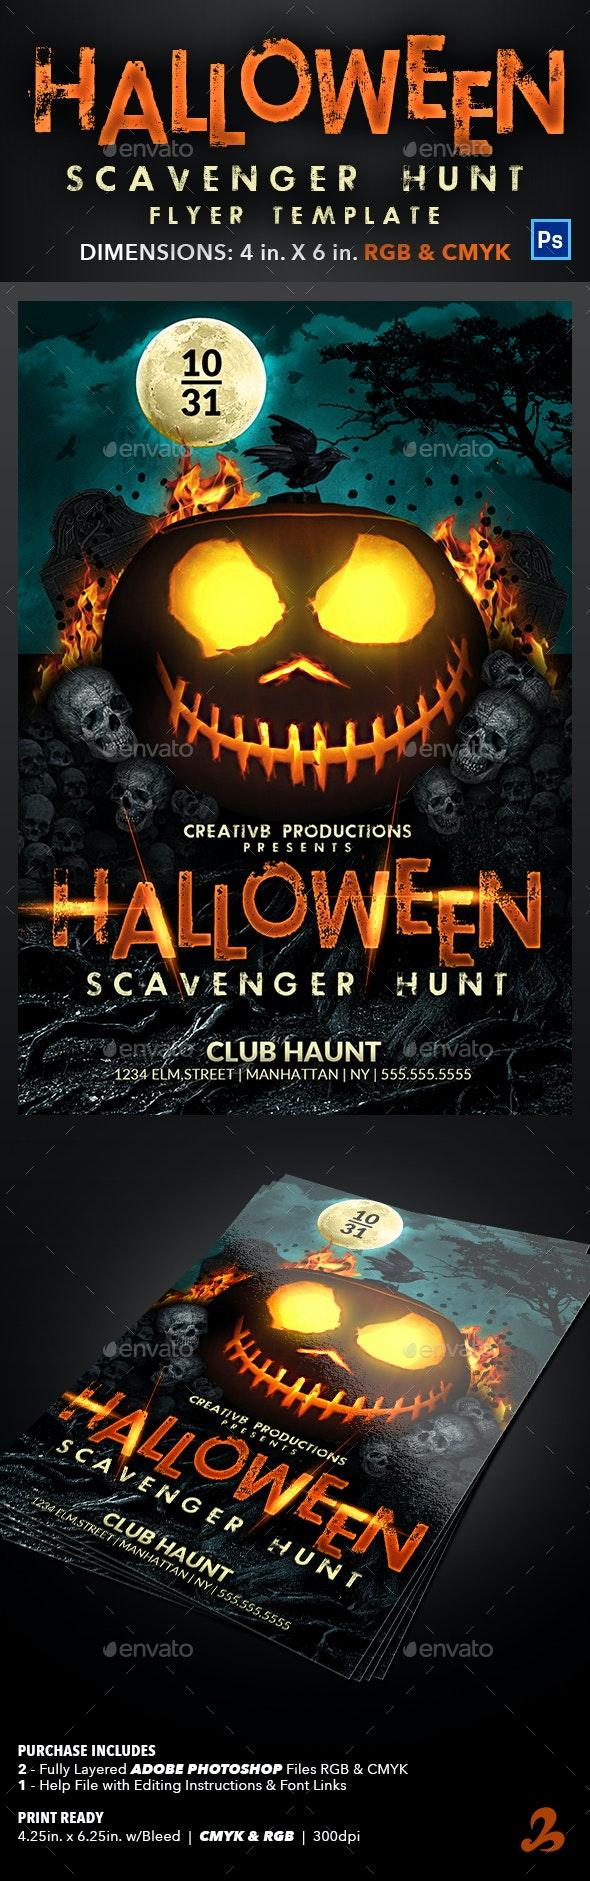 Halloween Scavenger Hunt Flyer Template - Events Flyers